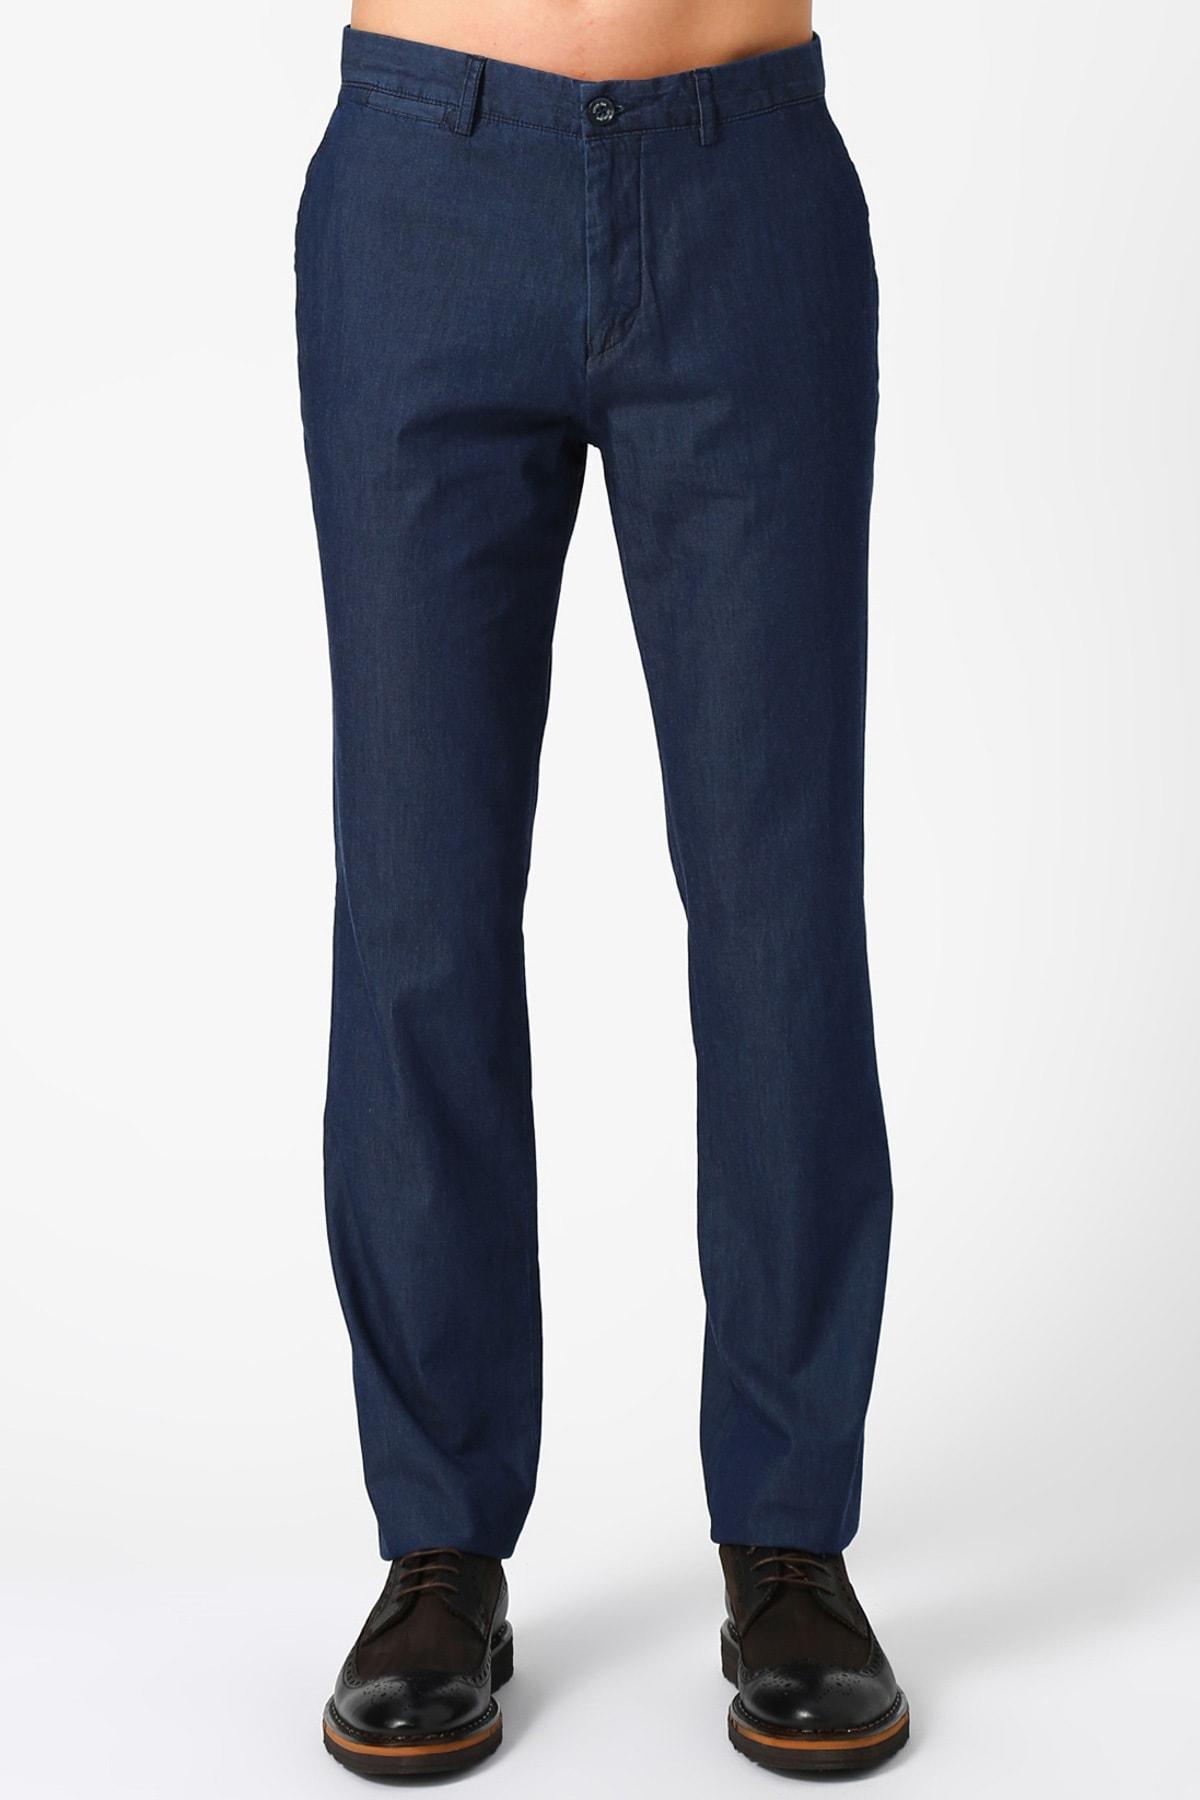 Cotton Bar Erkek Lacivert Pantolon 503155005 2